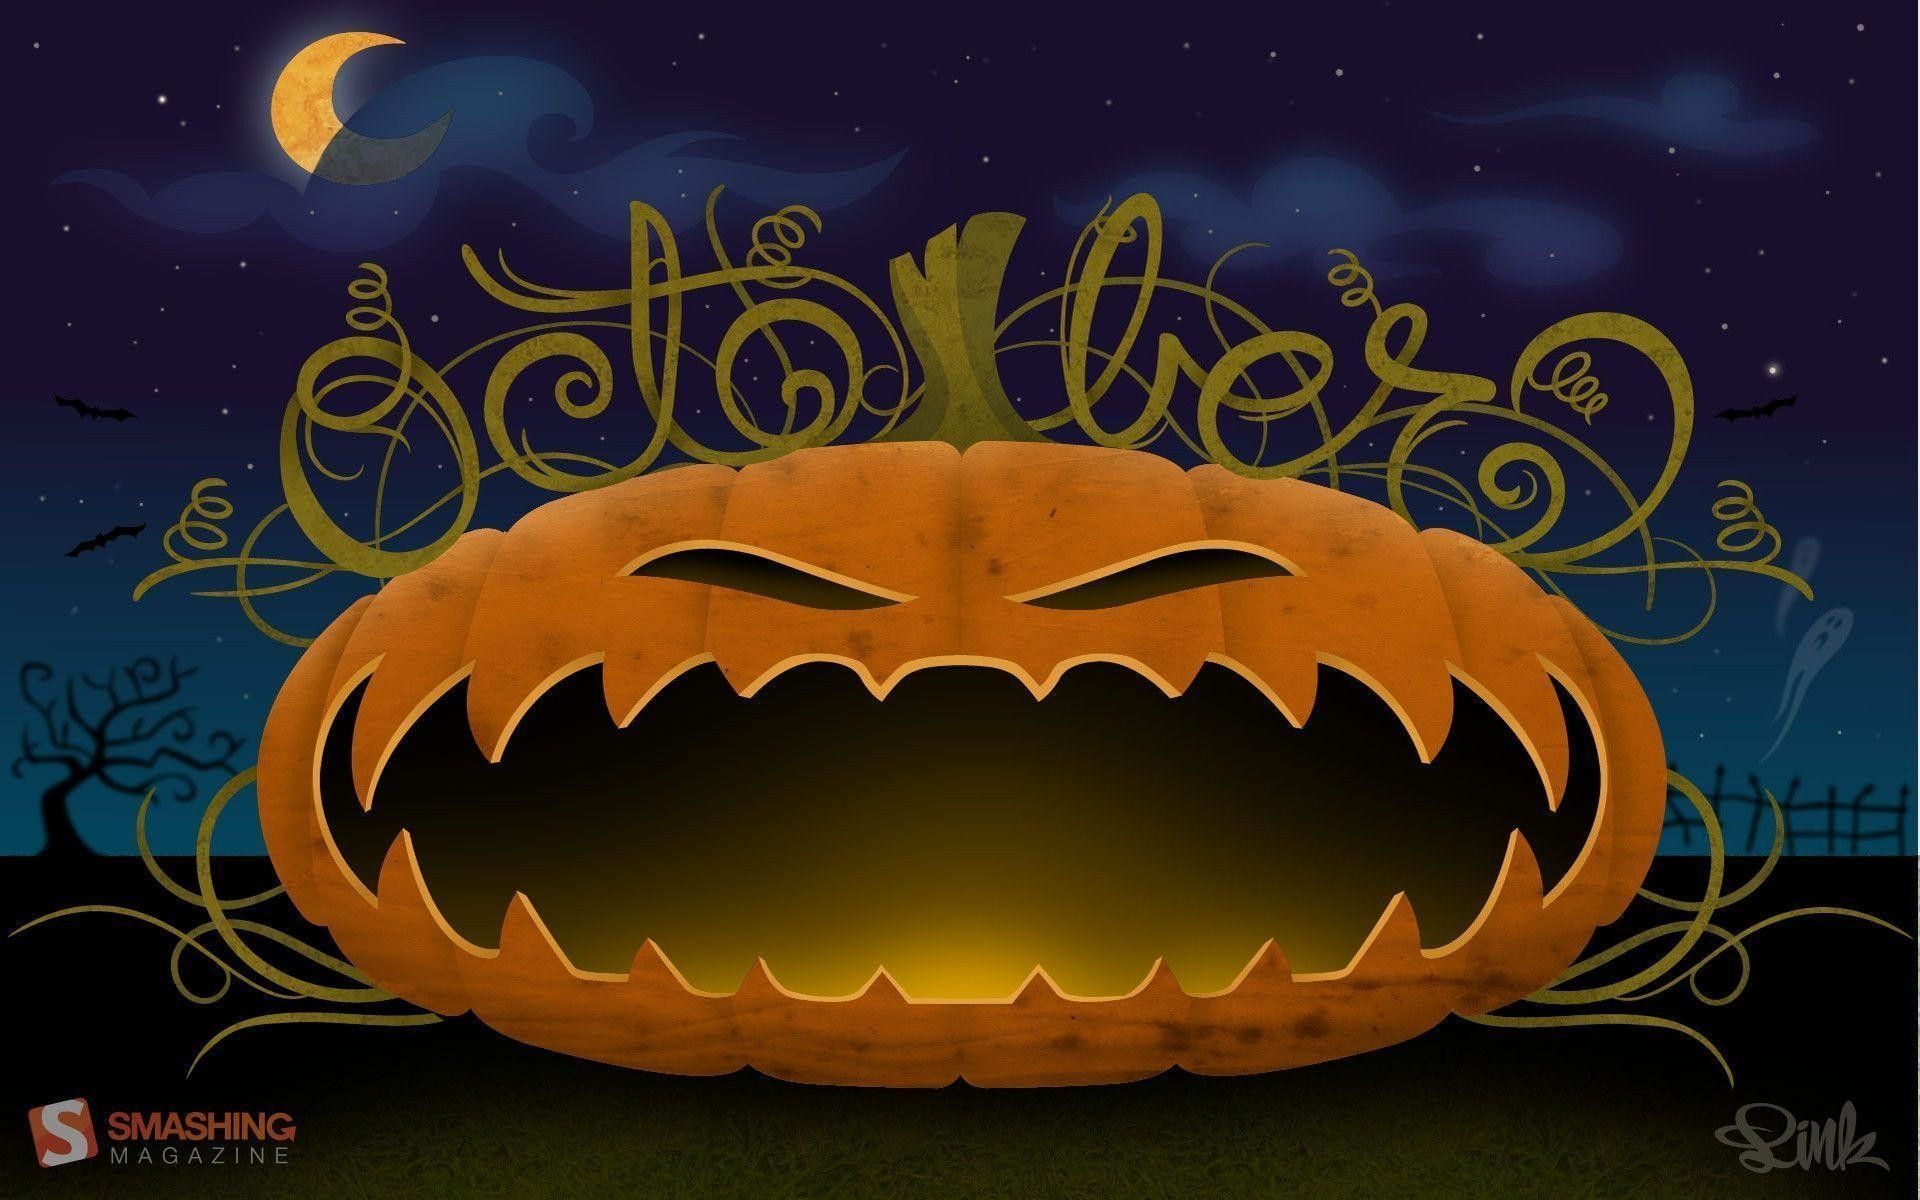 Halloween Desktop Wallpapers FREE on Latoro.com